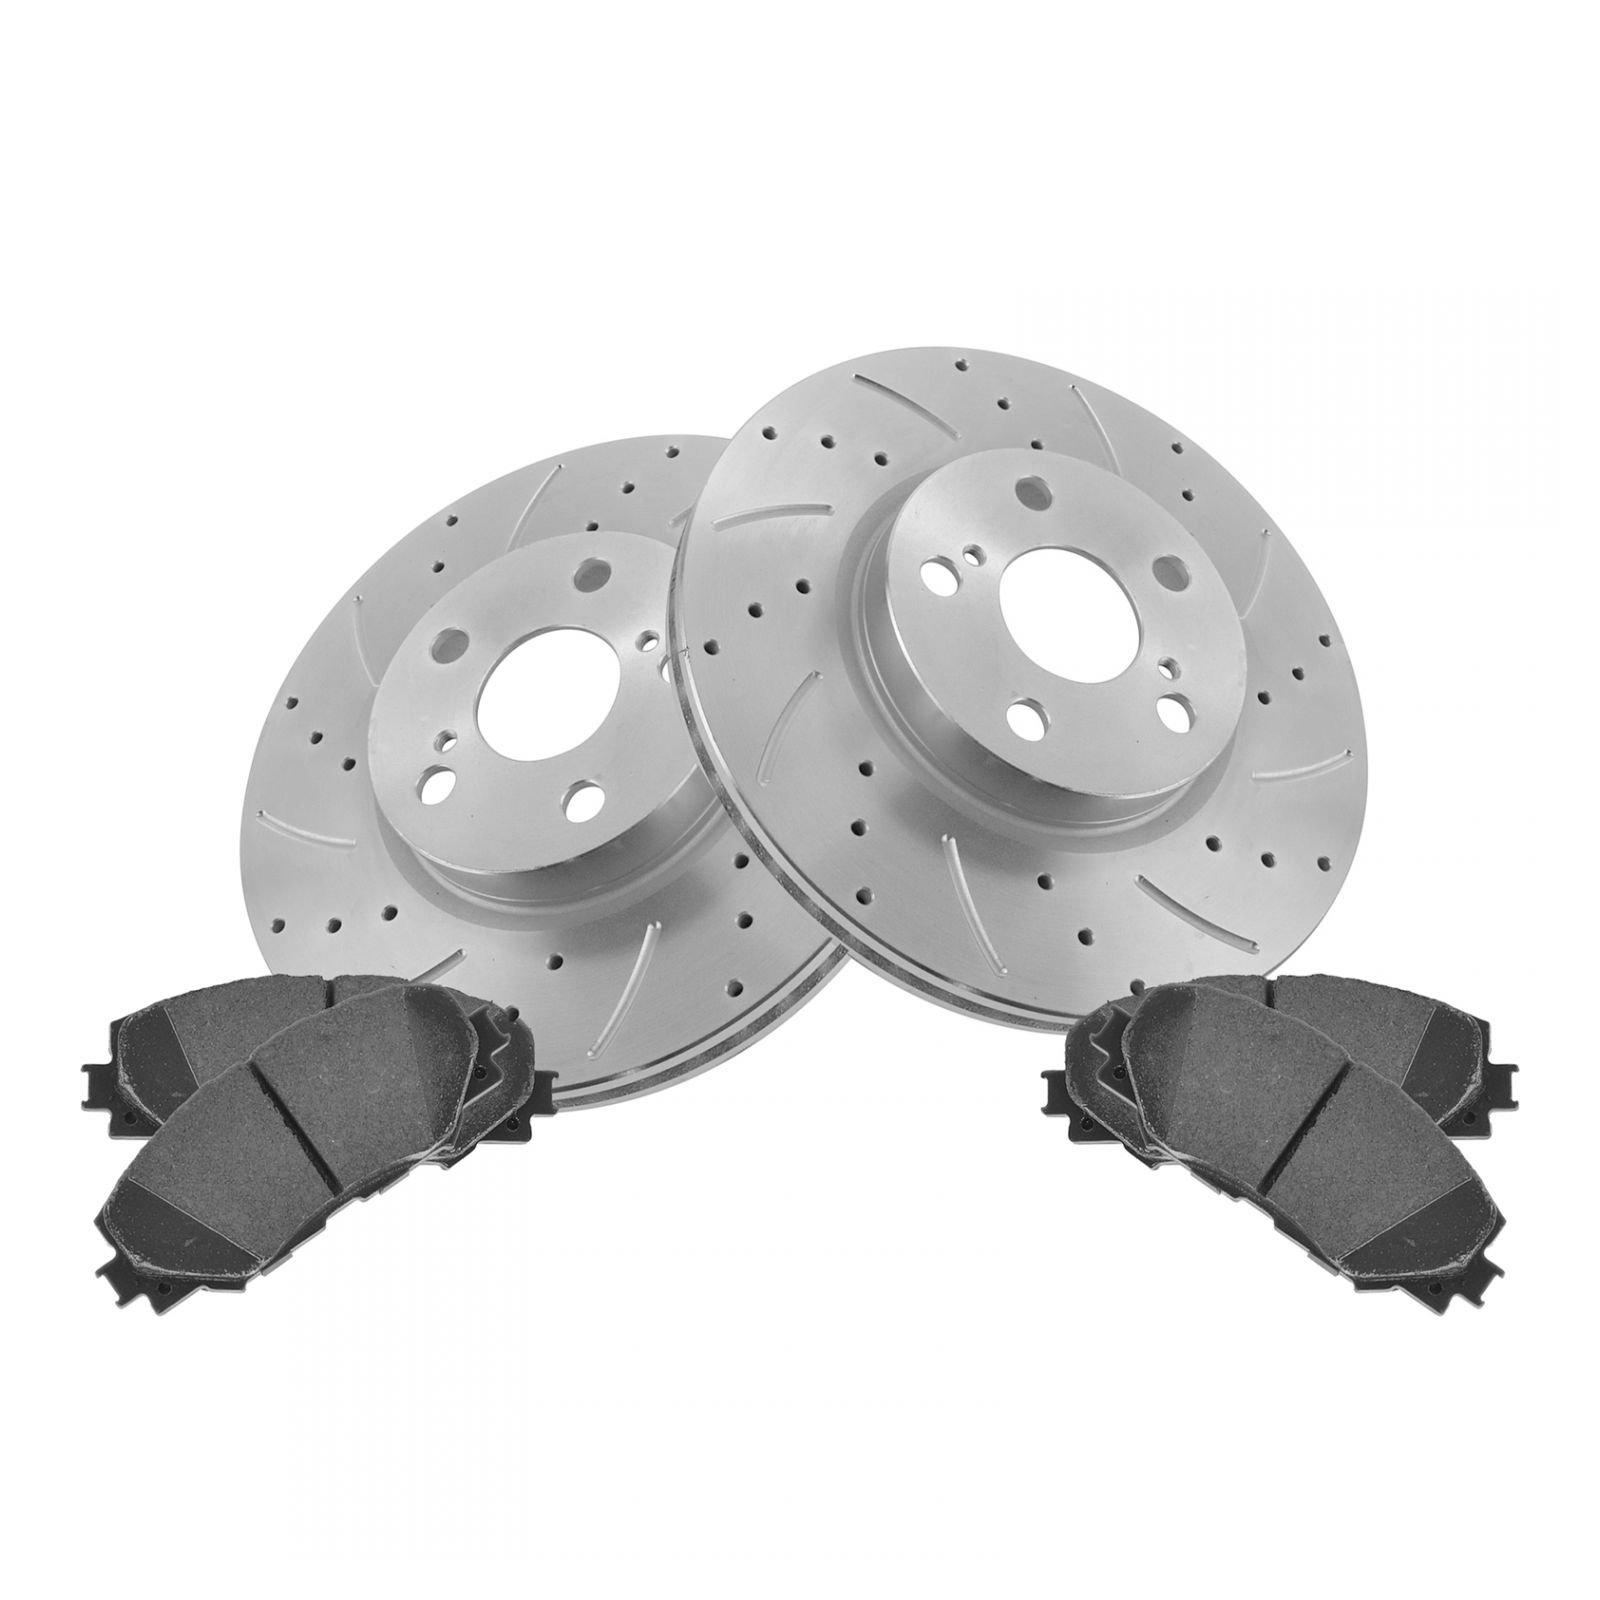 Fits: 2013 13 2014 14 2015 15 Toyota Rav 4 275mm Diameter Front Rotors Premium Cross Drilled Rotors + Metallic Pads TA039821 Max Brakes Front Performance Brake Kit